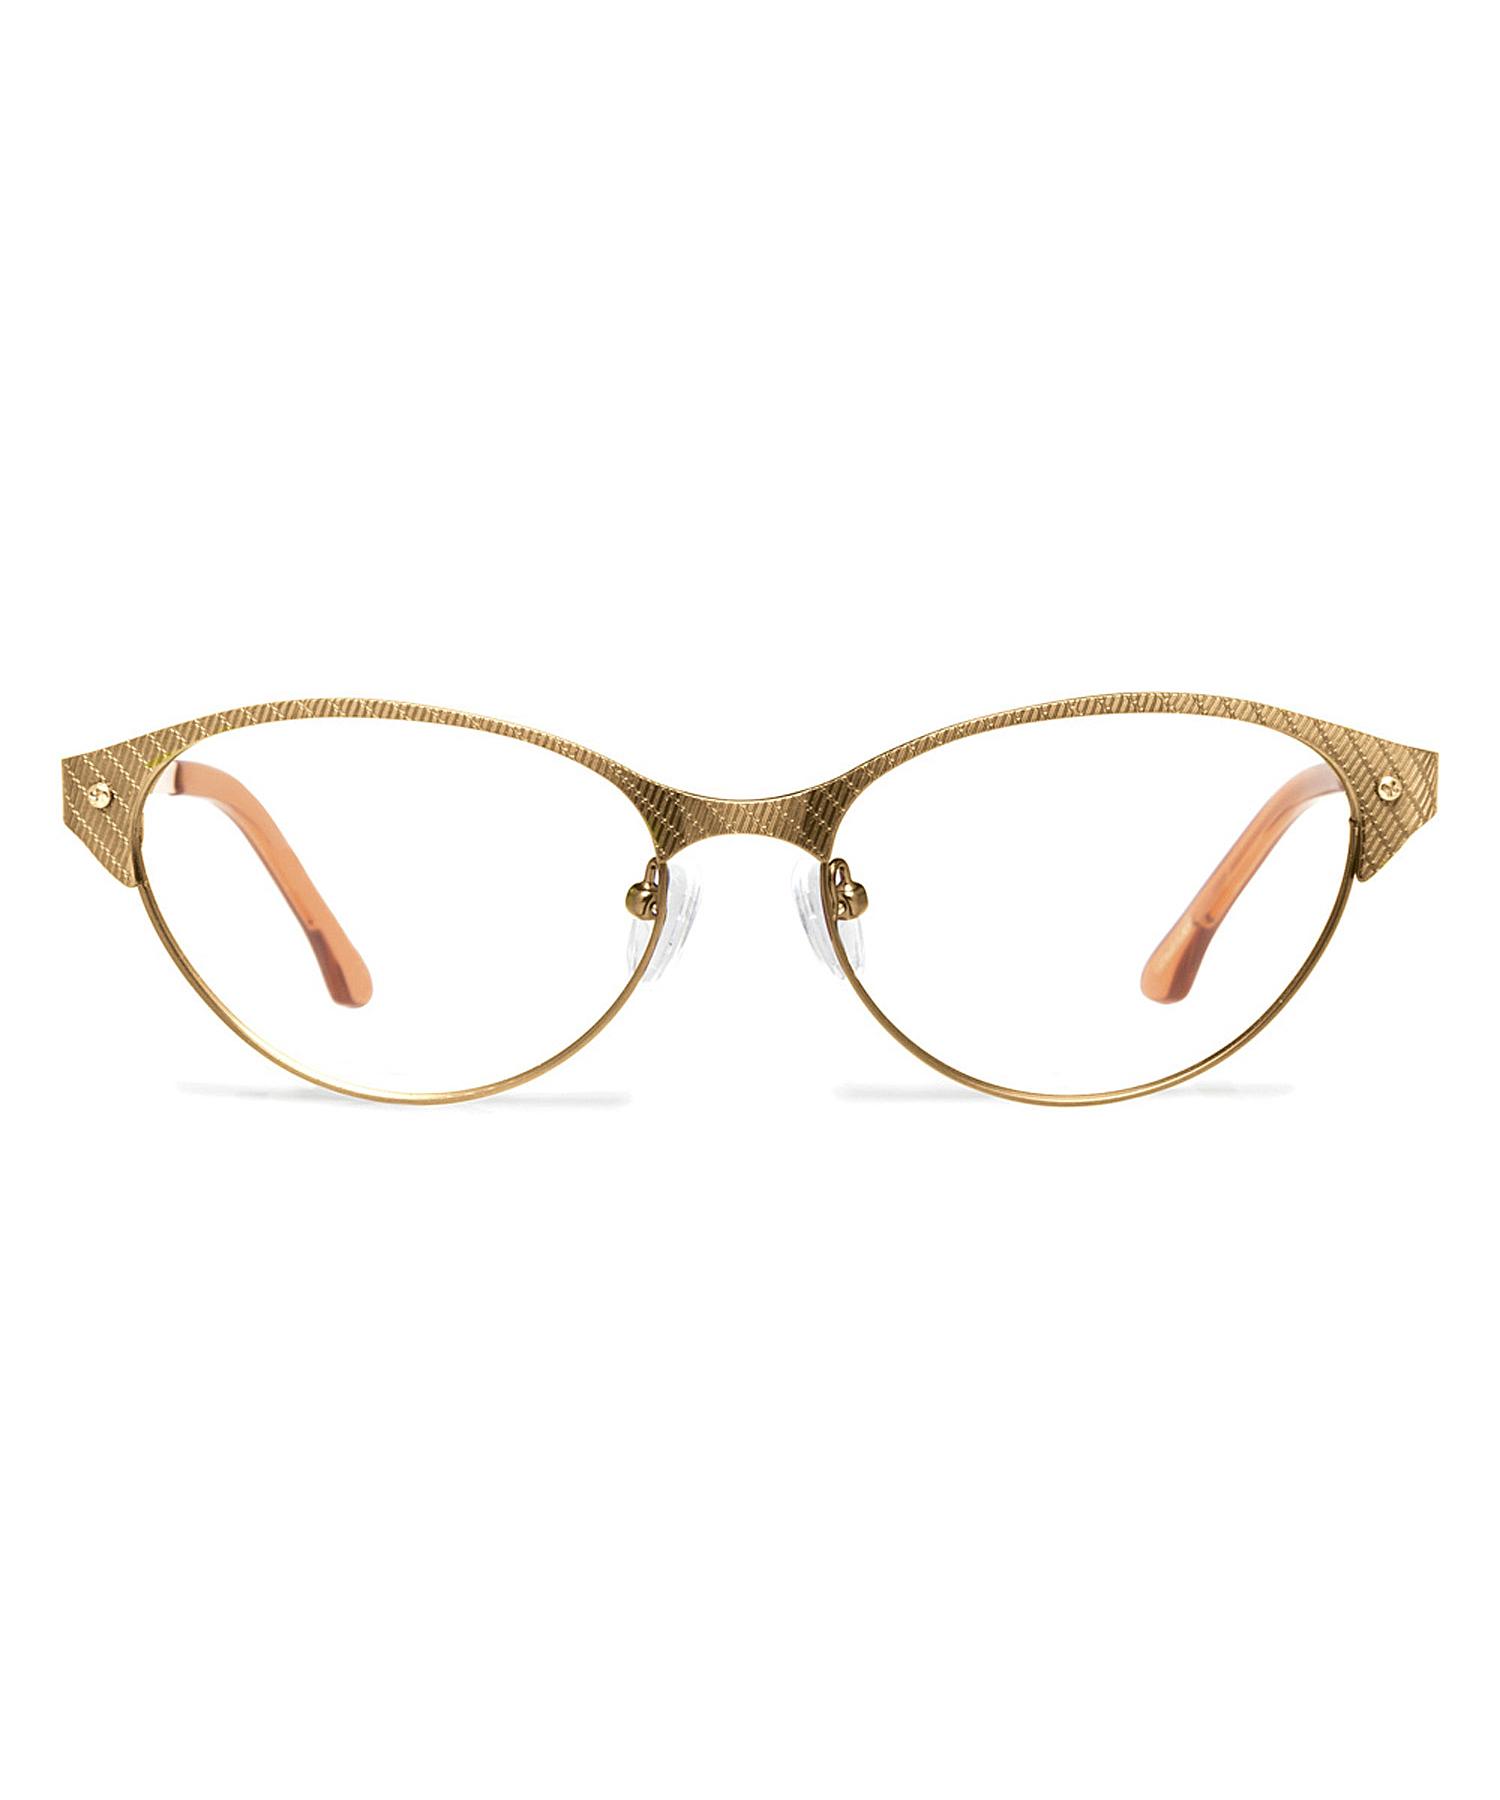 Gold Metal Eyeglass Frames : Cynthia rowley Japanese Gold Cat-eye Metal Eyeglasses in ...